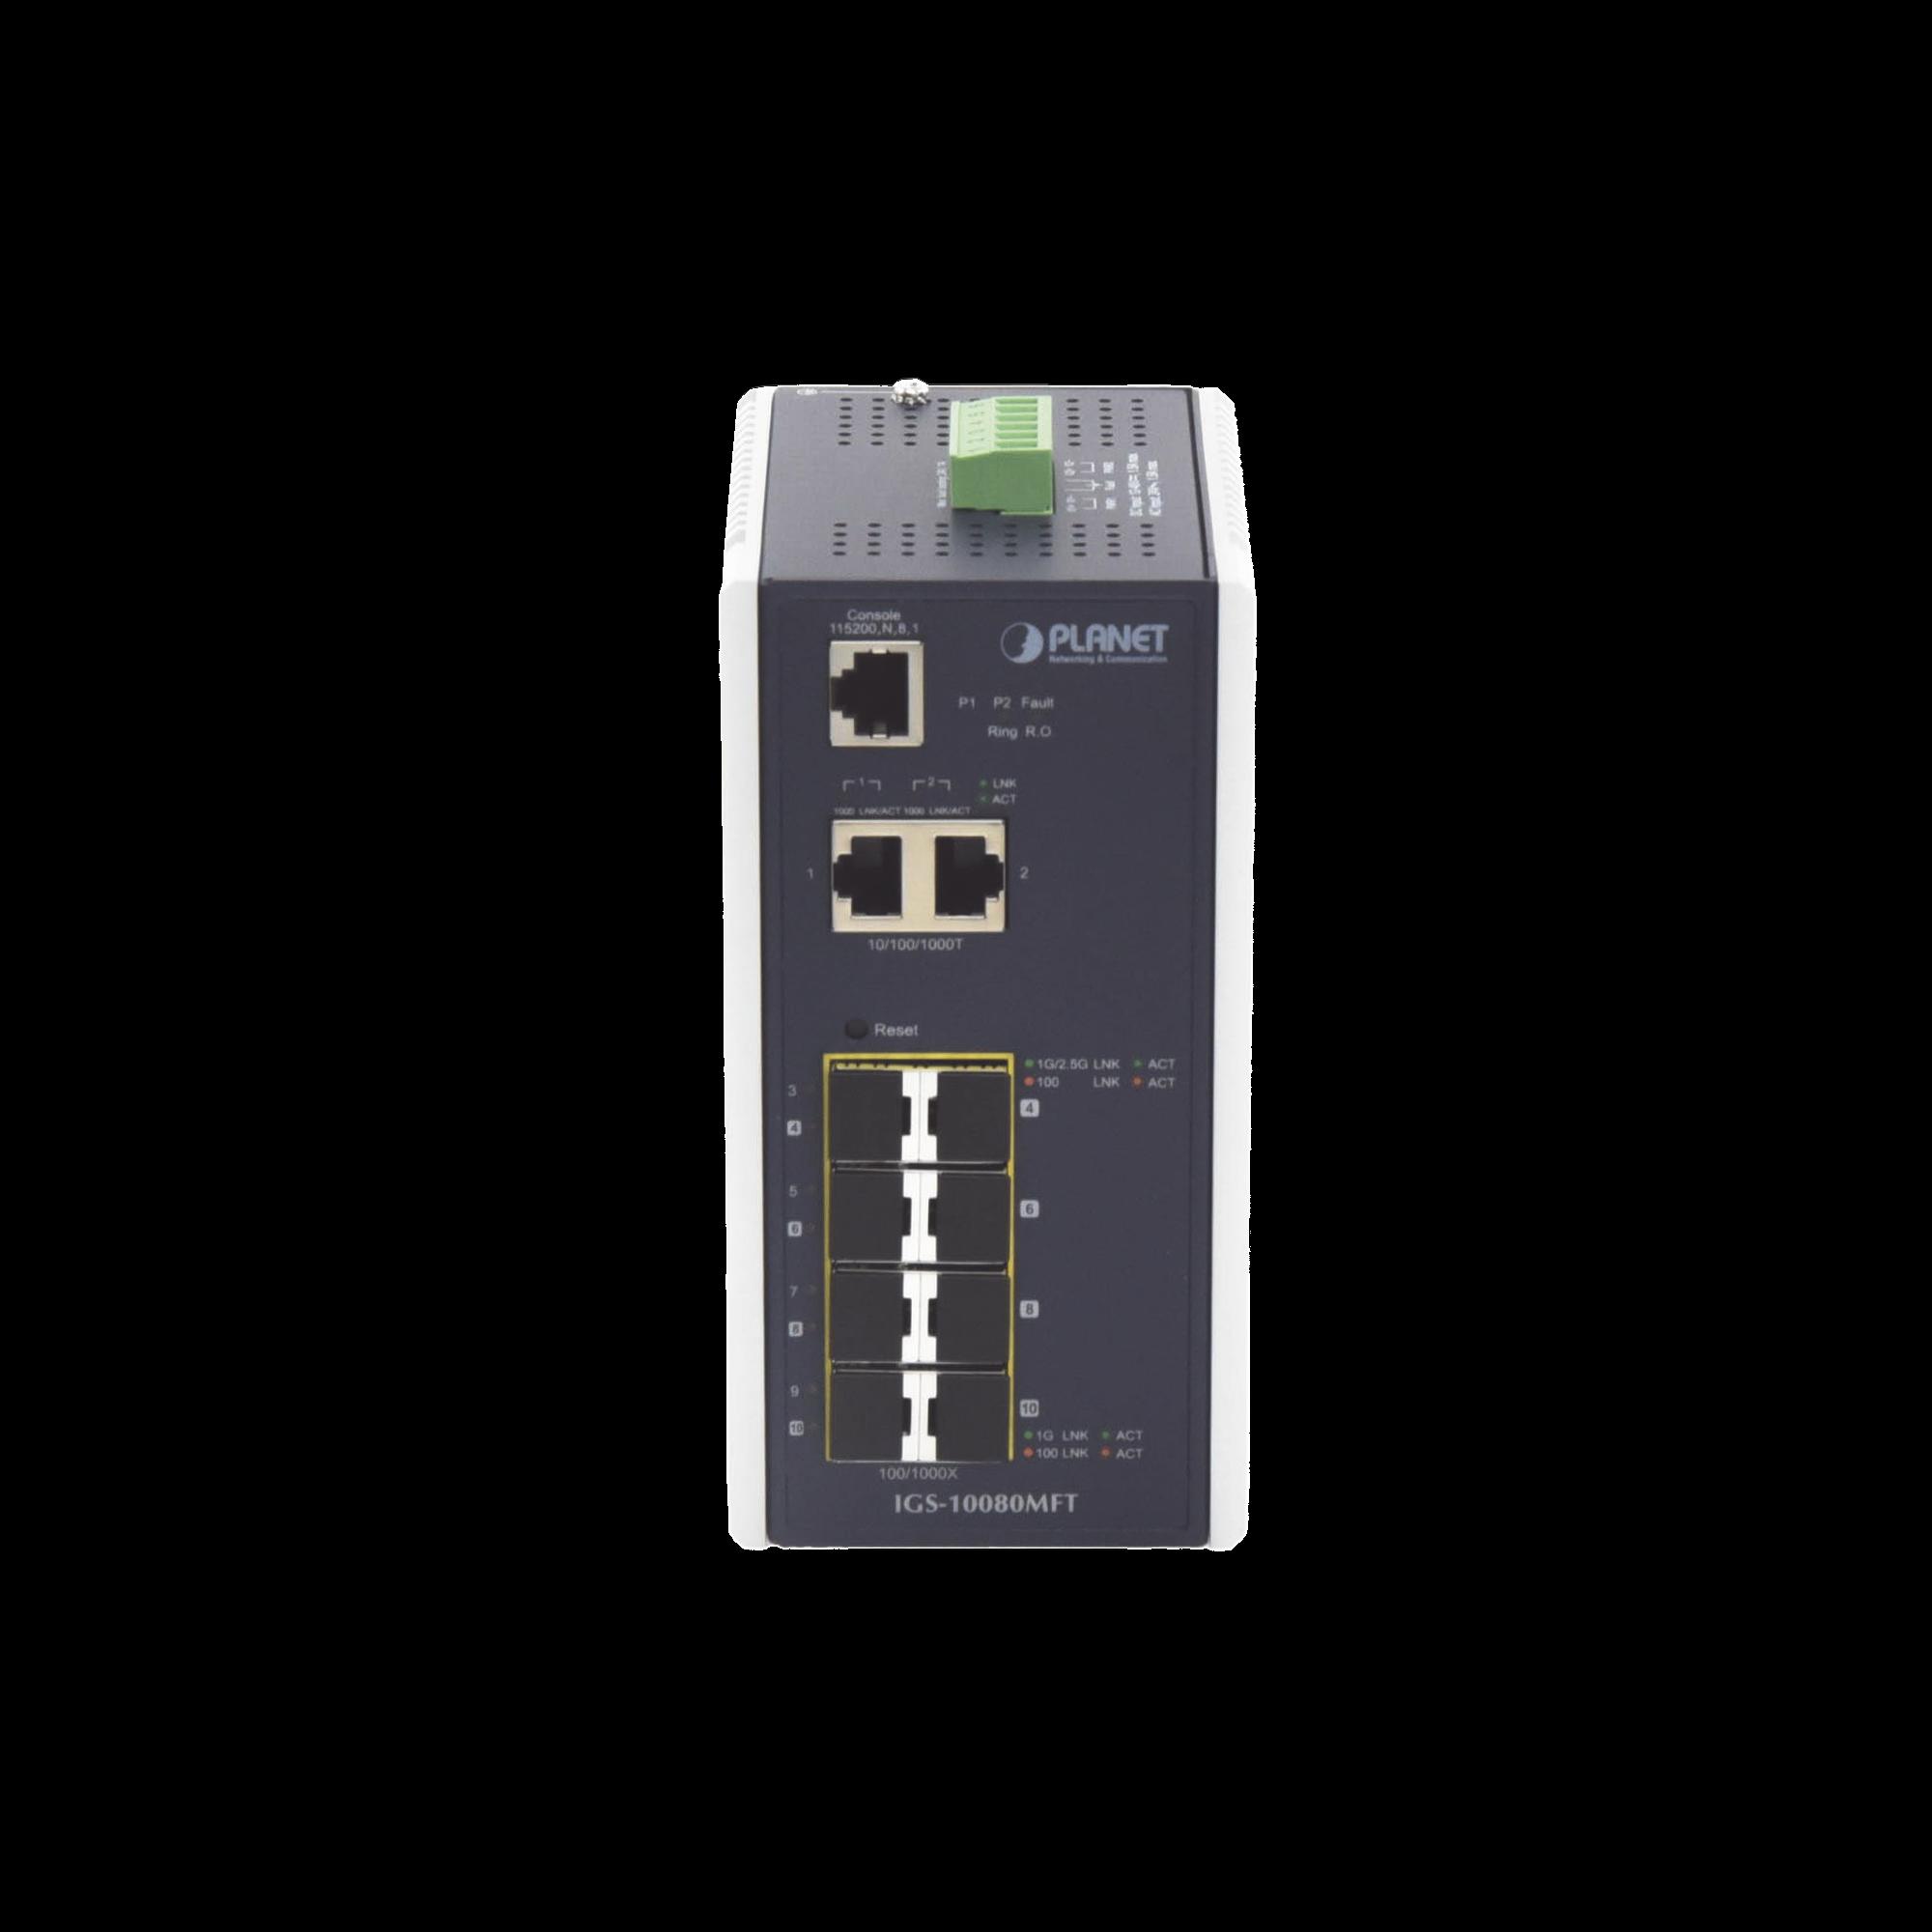 Switch Industrial Administrable L2+, 8 Puertos 1G SFP, 2 Puertos TP Gigabit, (-40 ~75 grados C)